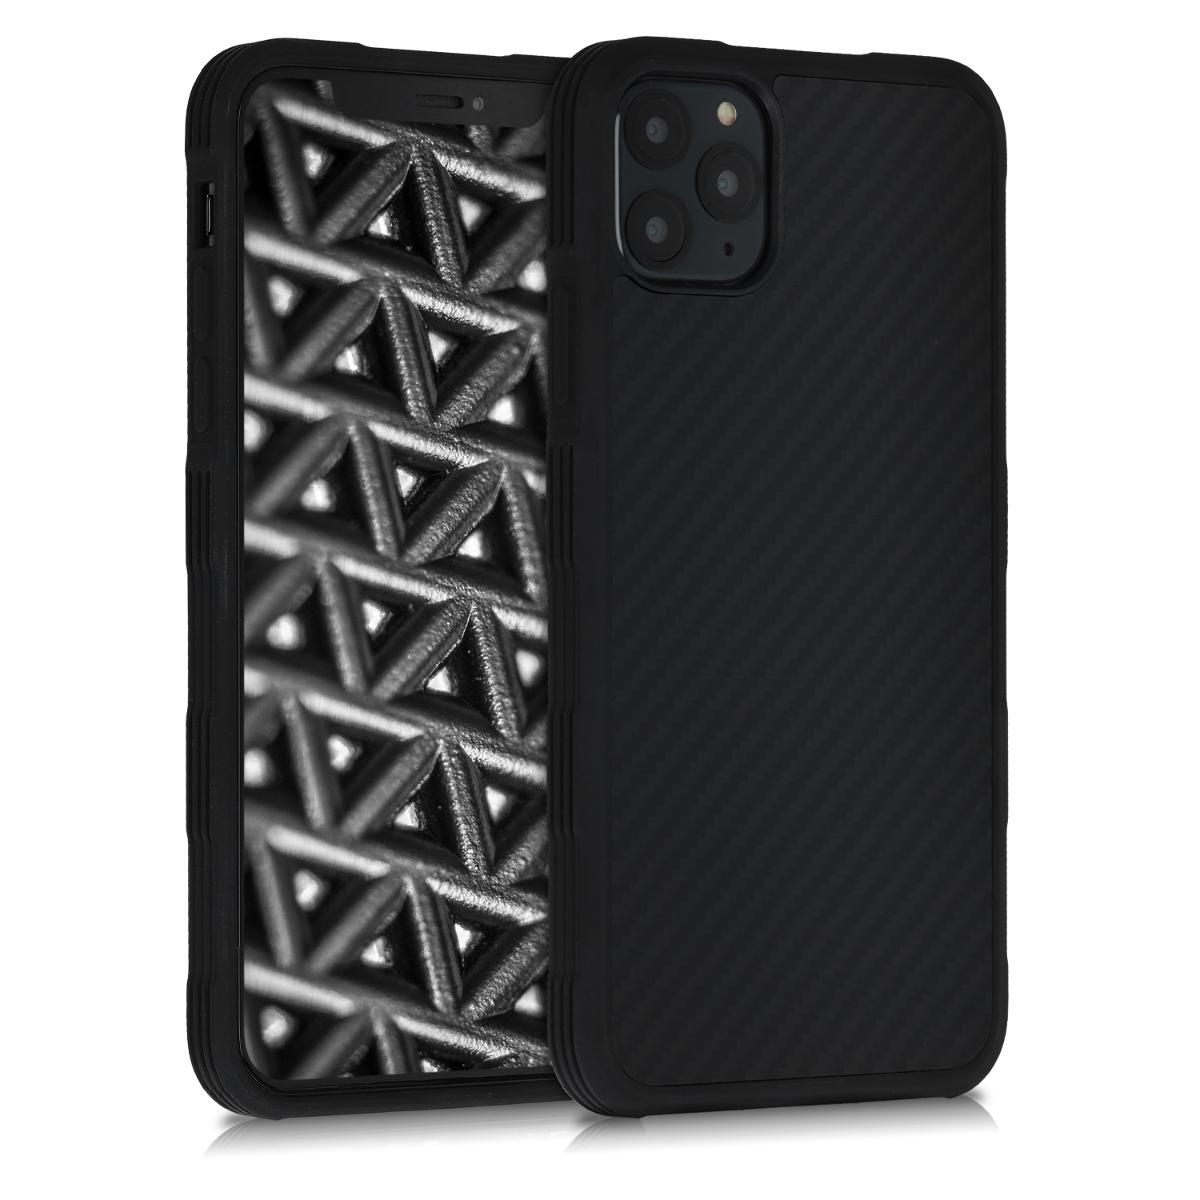 Aramidpouzdro pro Apple iPhone 11 Pro Max - Černá